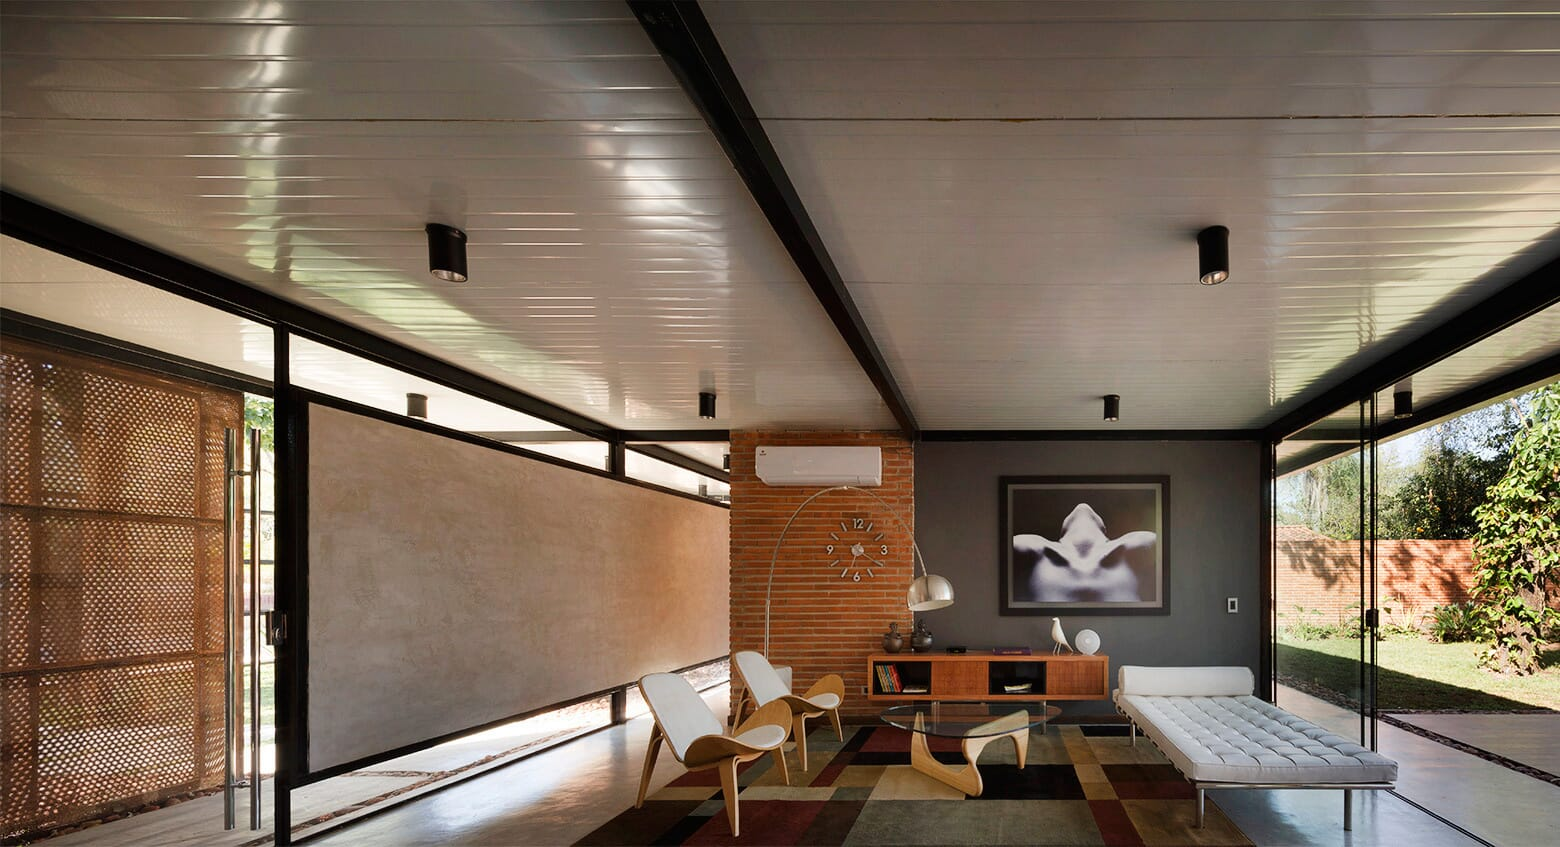 Take The Tour Of The La Escondida House by Nou Arquitectos